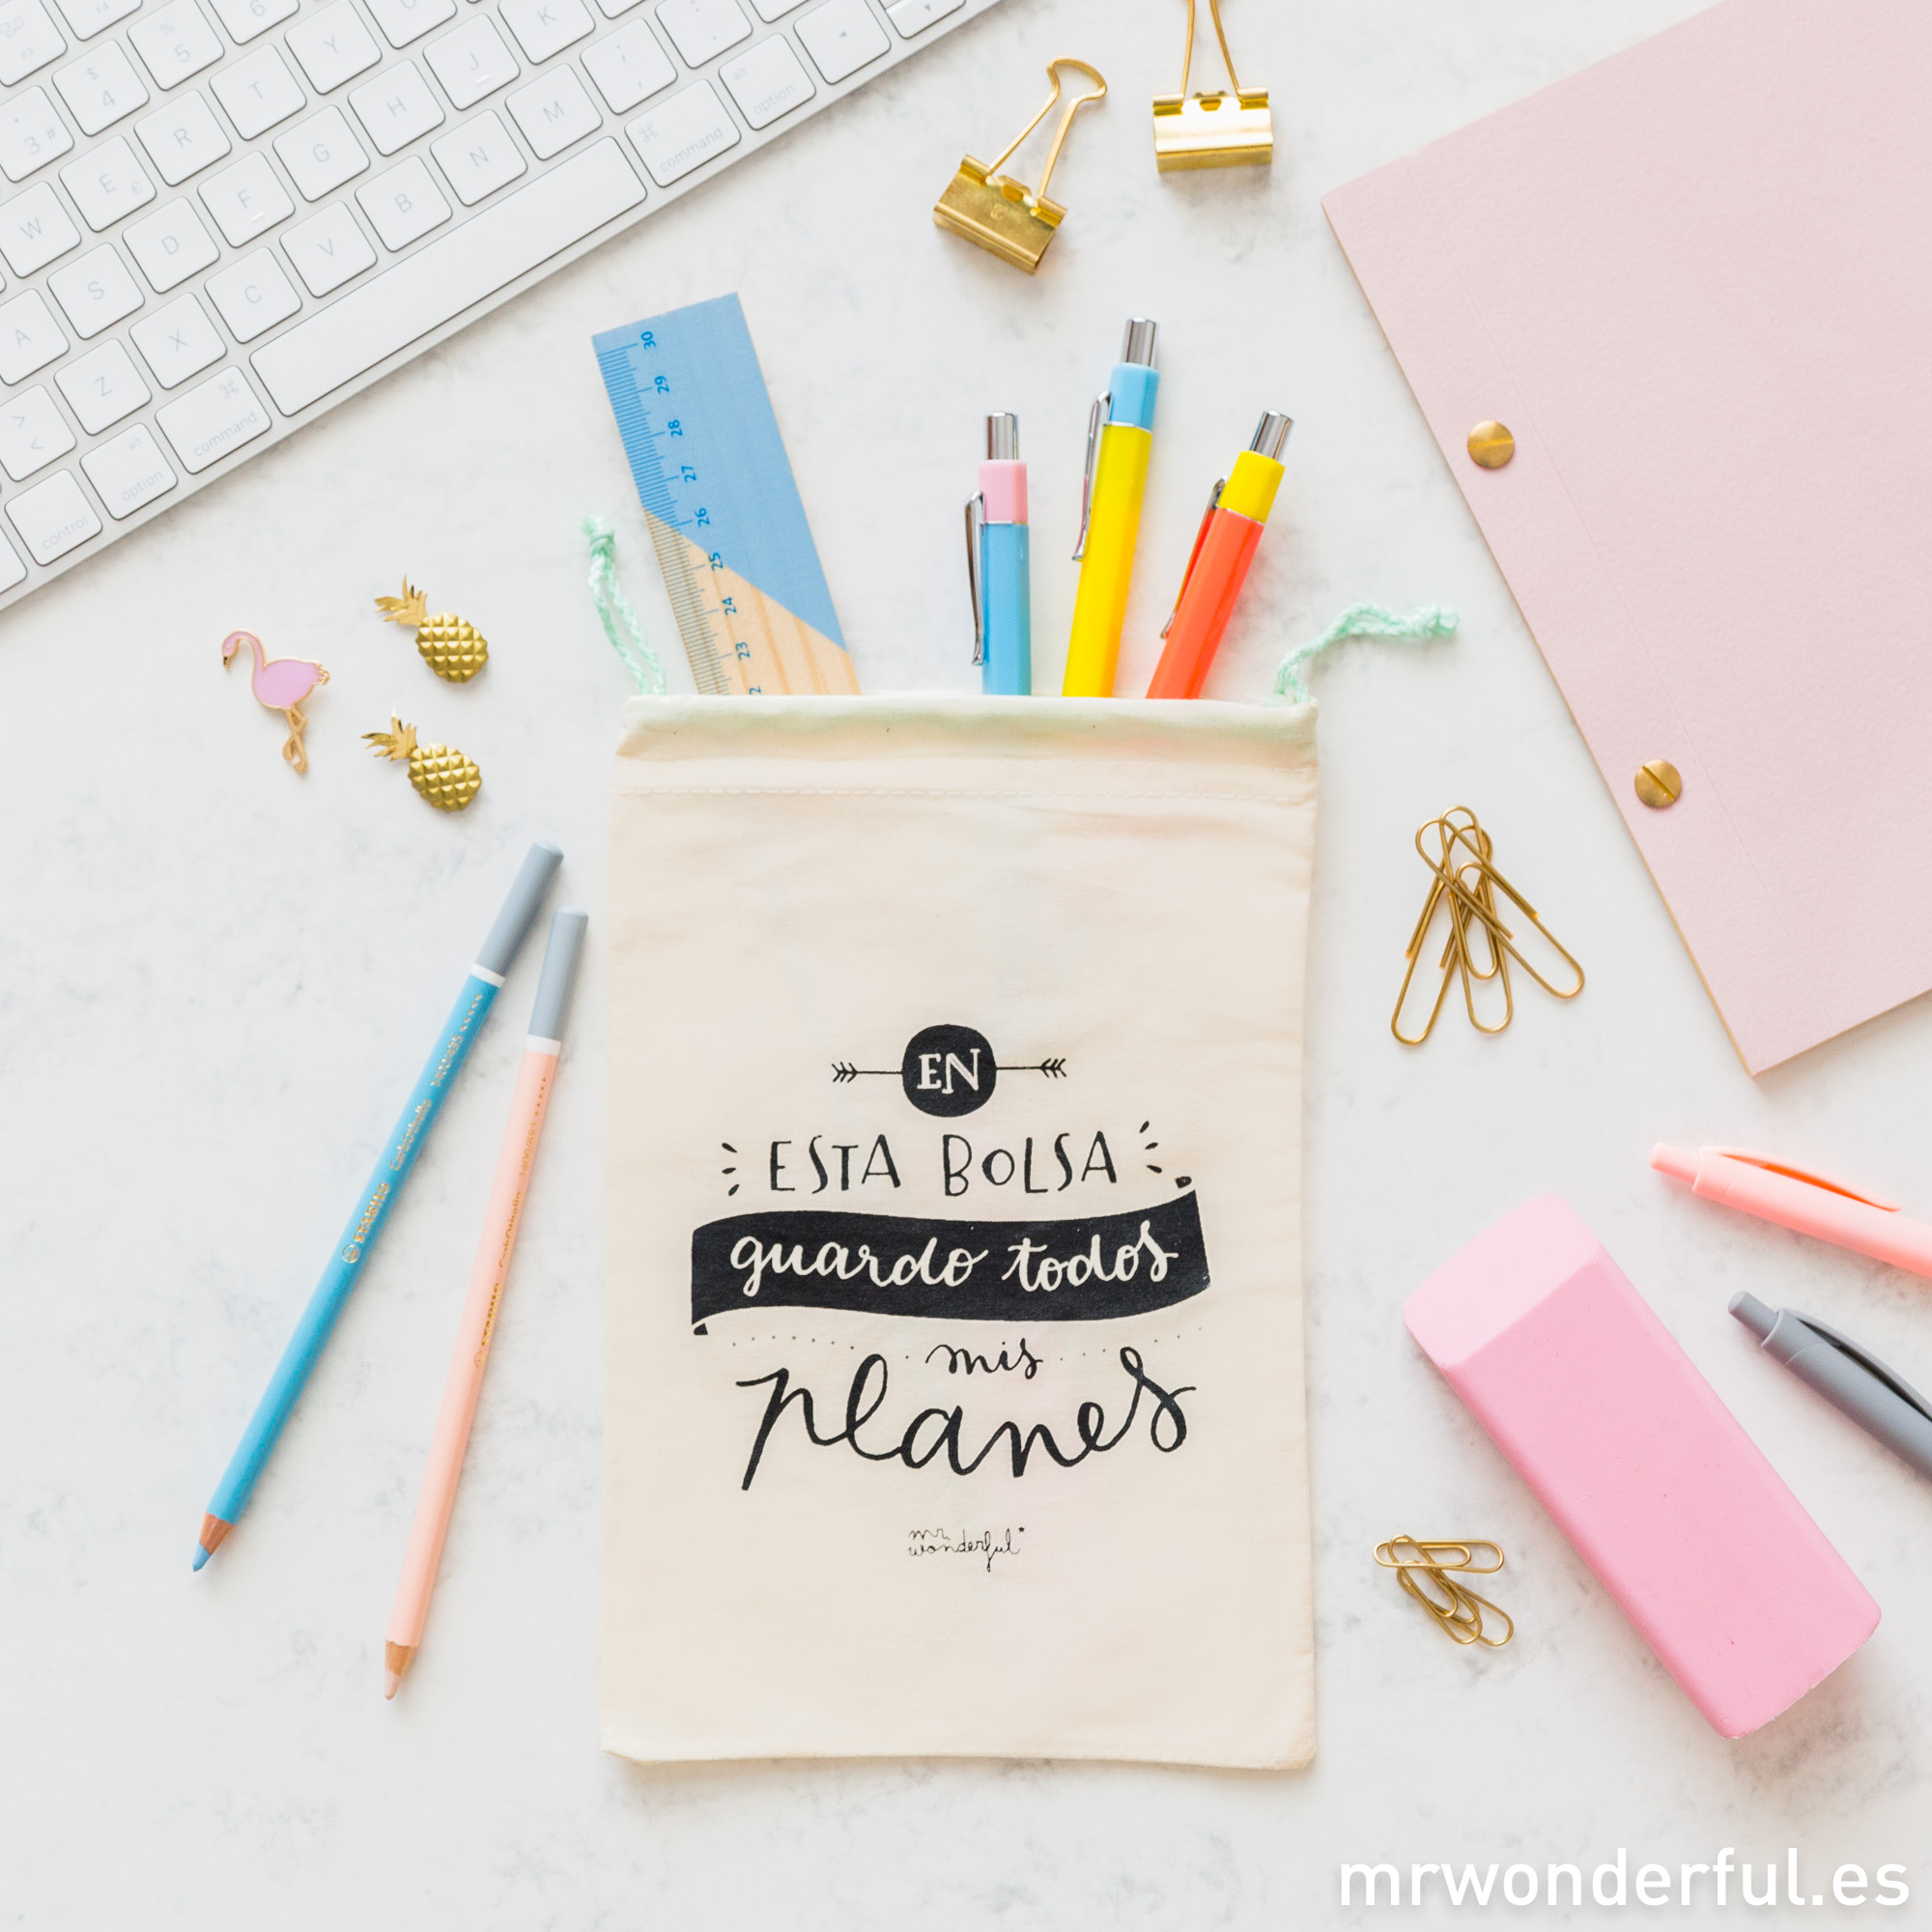 mrwonderful_bolsa-regalo-agenda-2-editar